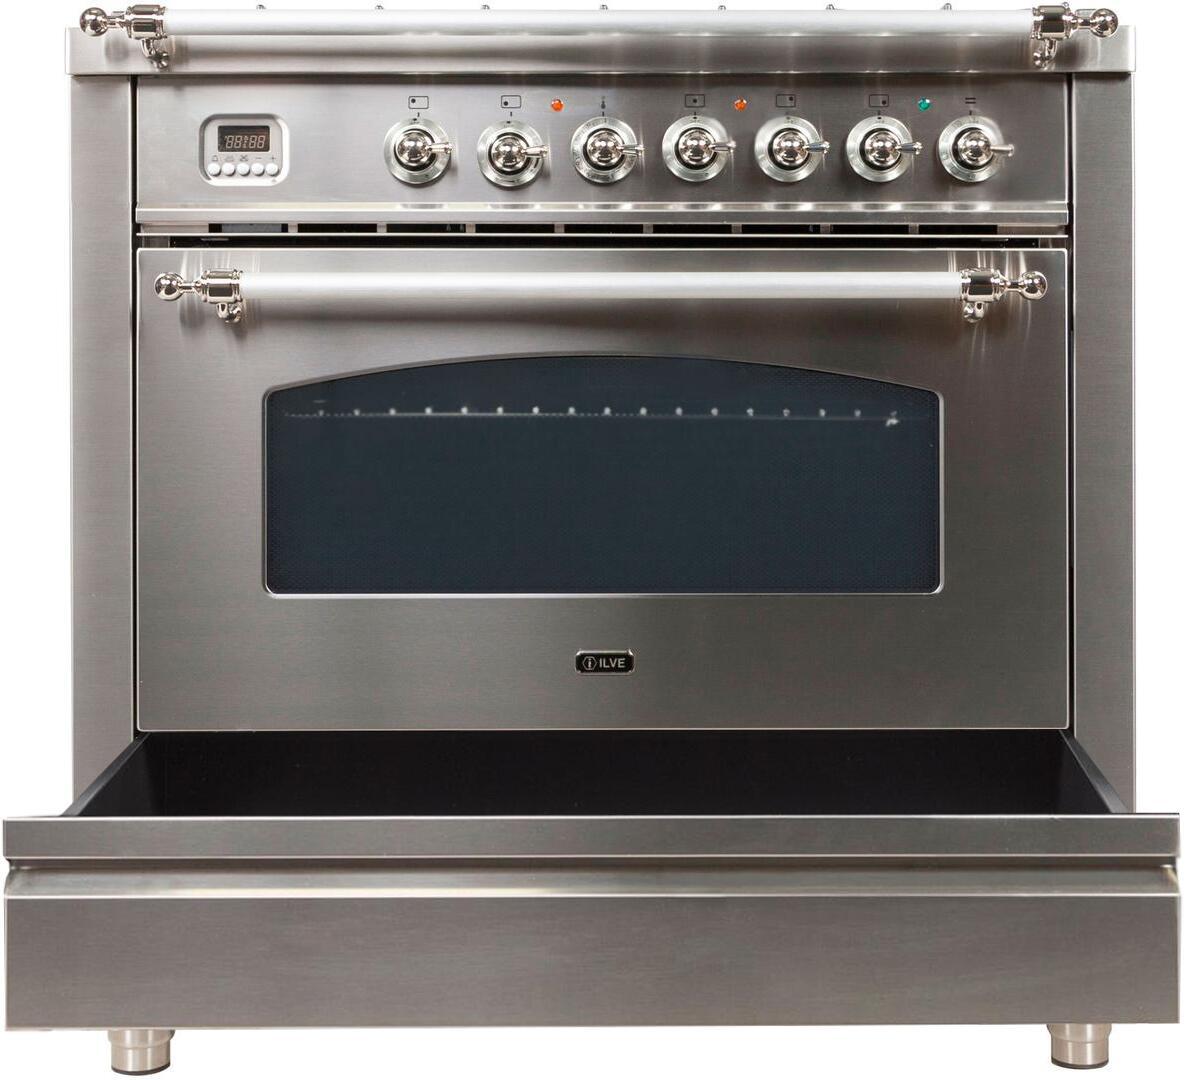 Ilve Nostalgie UPN90FDMPIX Freestanding Dual Fuel Range Stainless Steel, UPN90FDMPIX Dishwarming Drawer